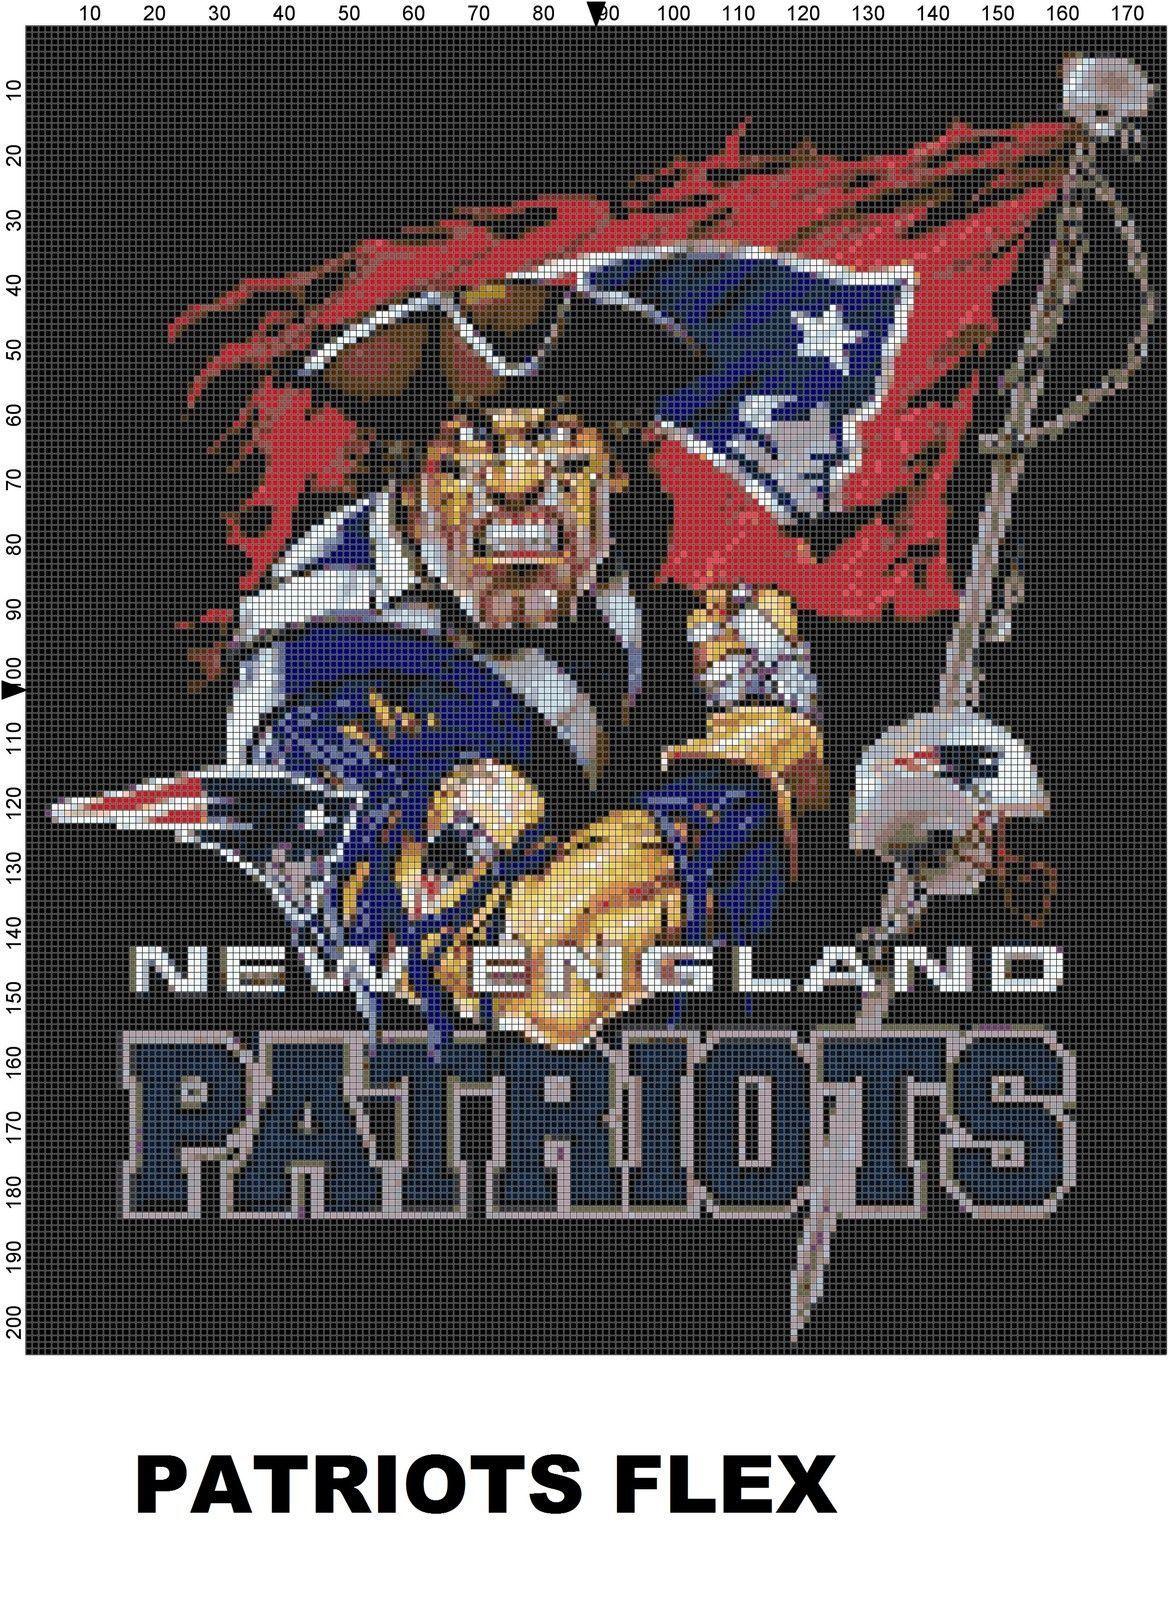 Nfl New England Patriots Mascot Cross Stitch Pattern New England Patriots New England Patriots Football Patriots Football